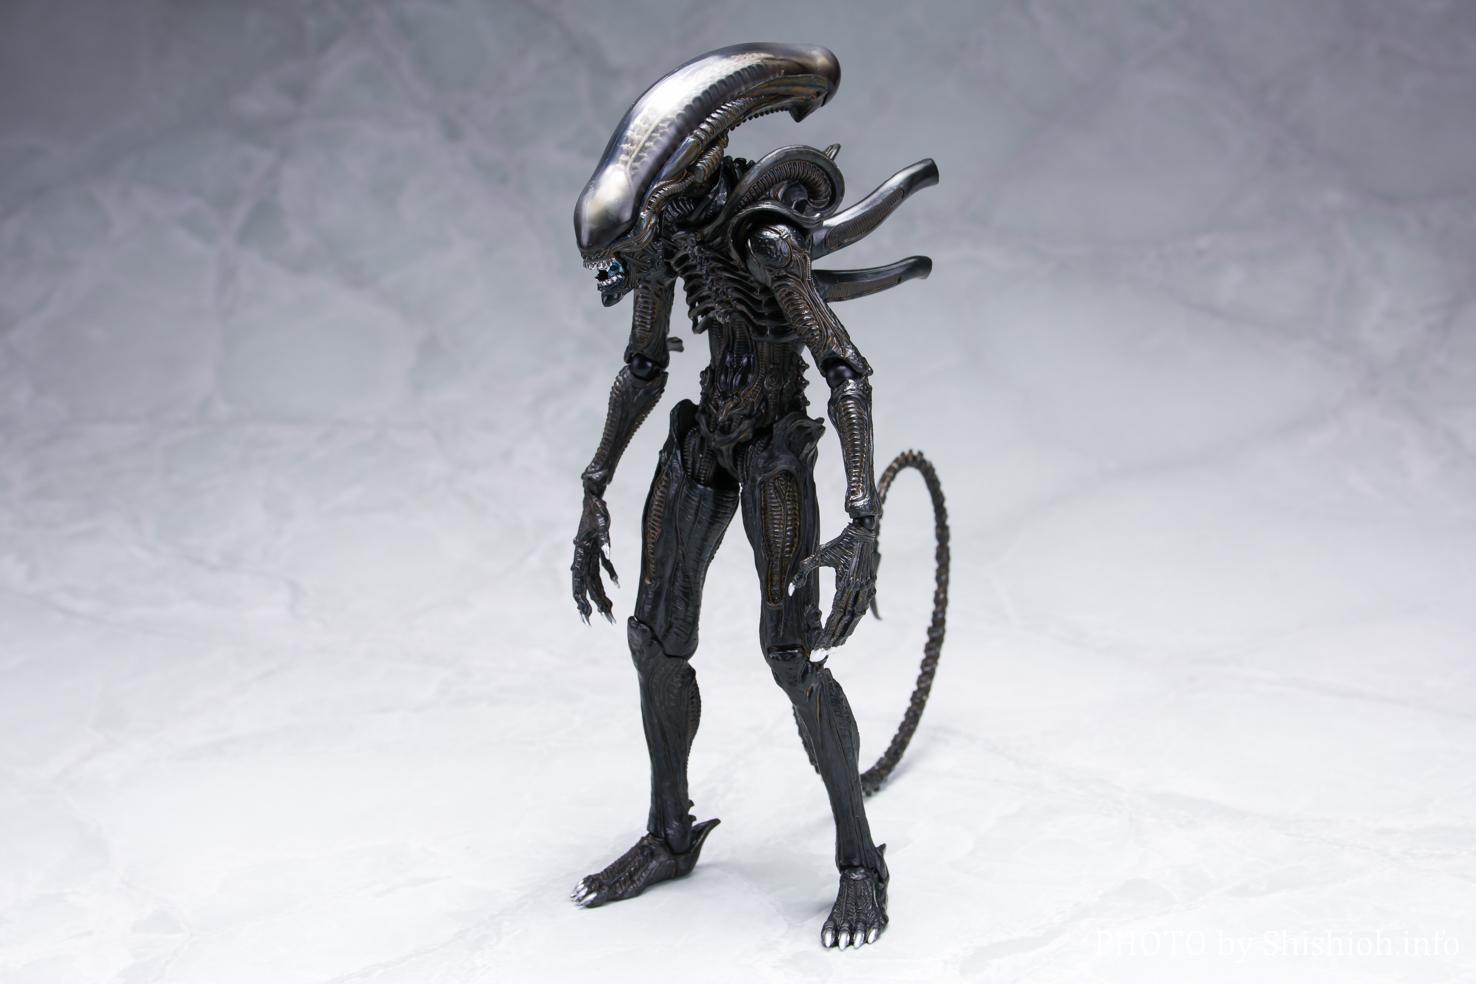 figma SP-108 エイリアン 竹谷隆之アレンジver.